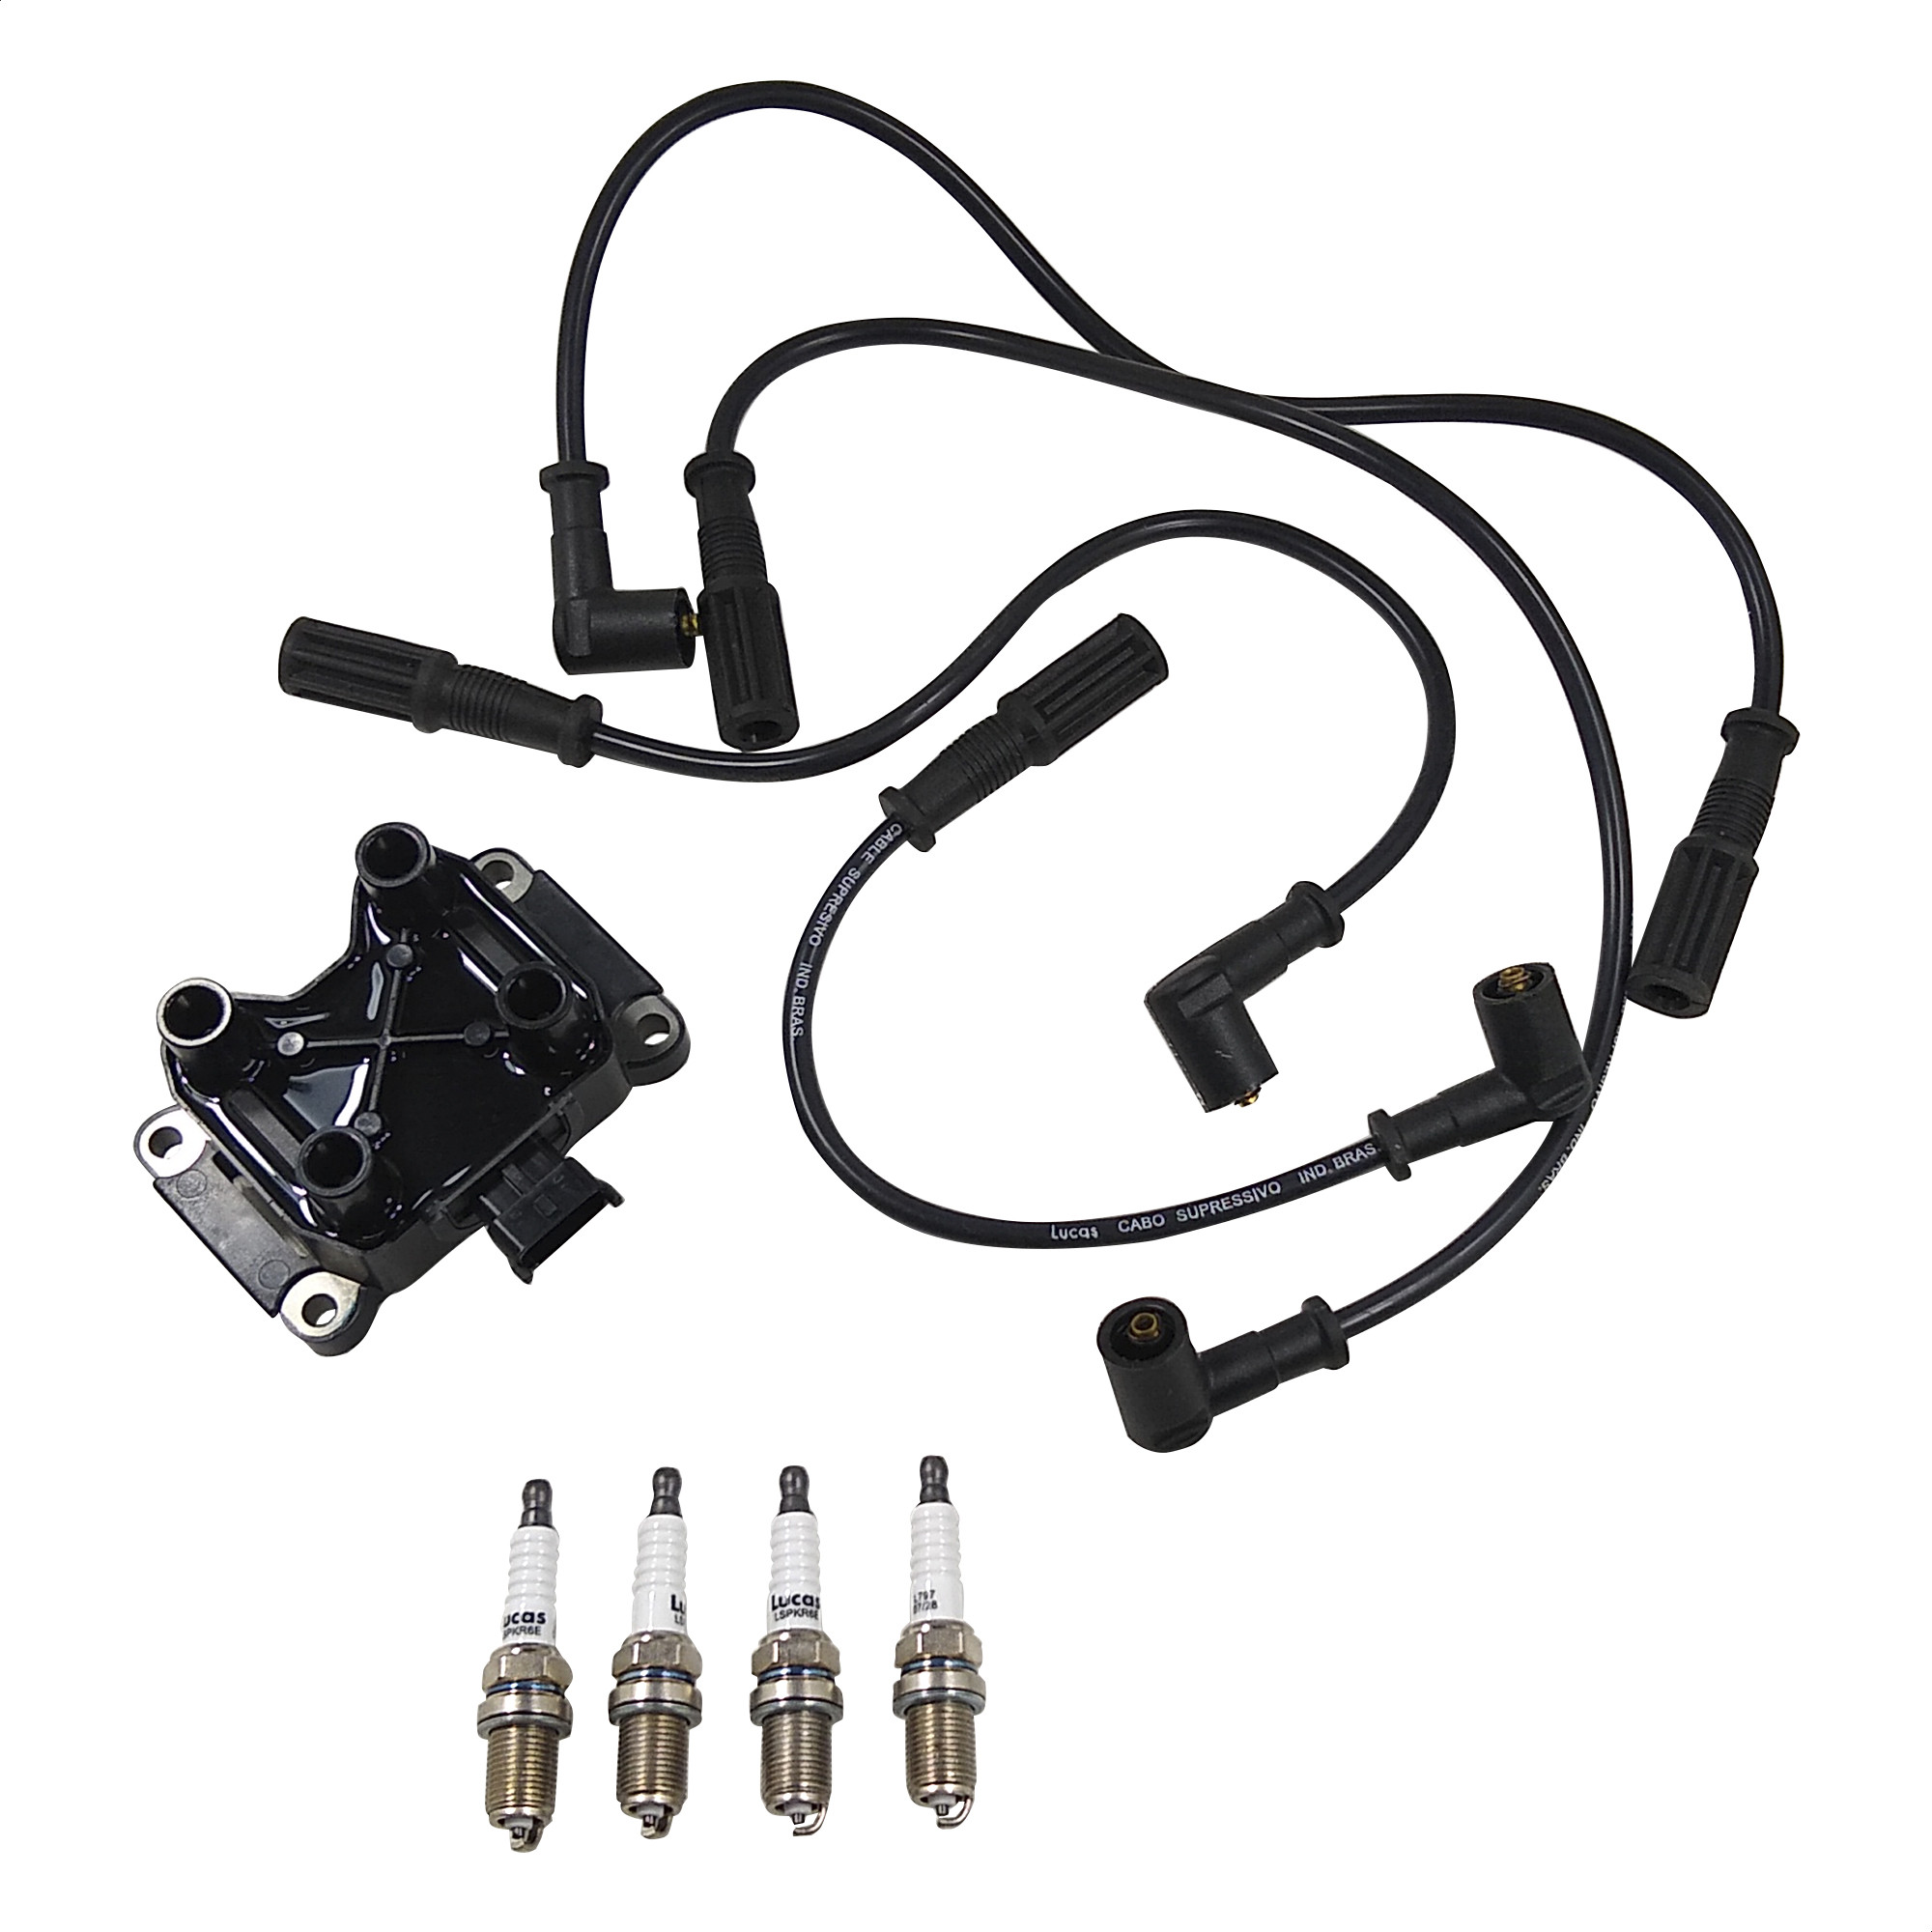 Kit de Encendido Bobina / Cables / Bujia Fispa L100018